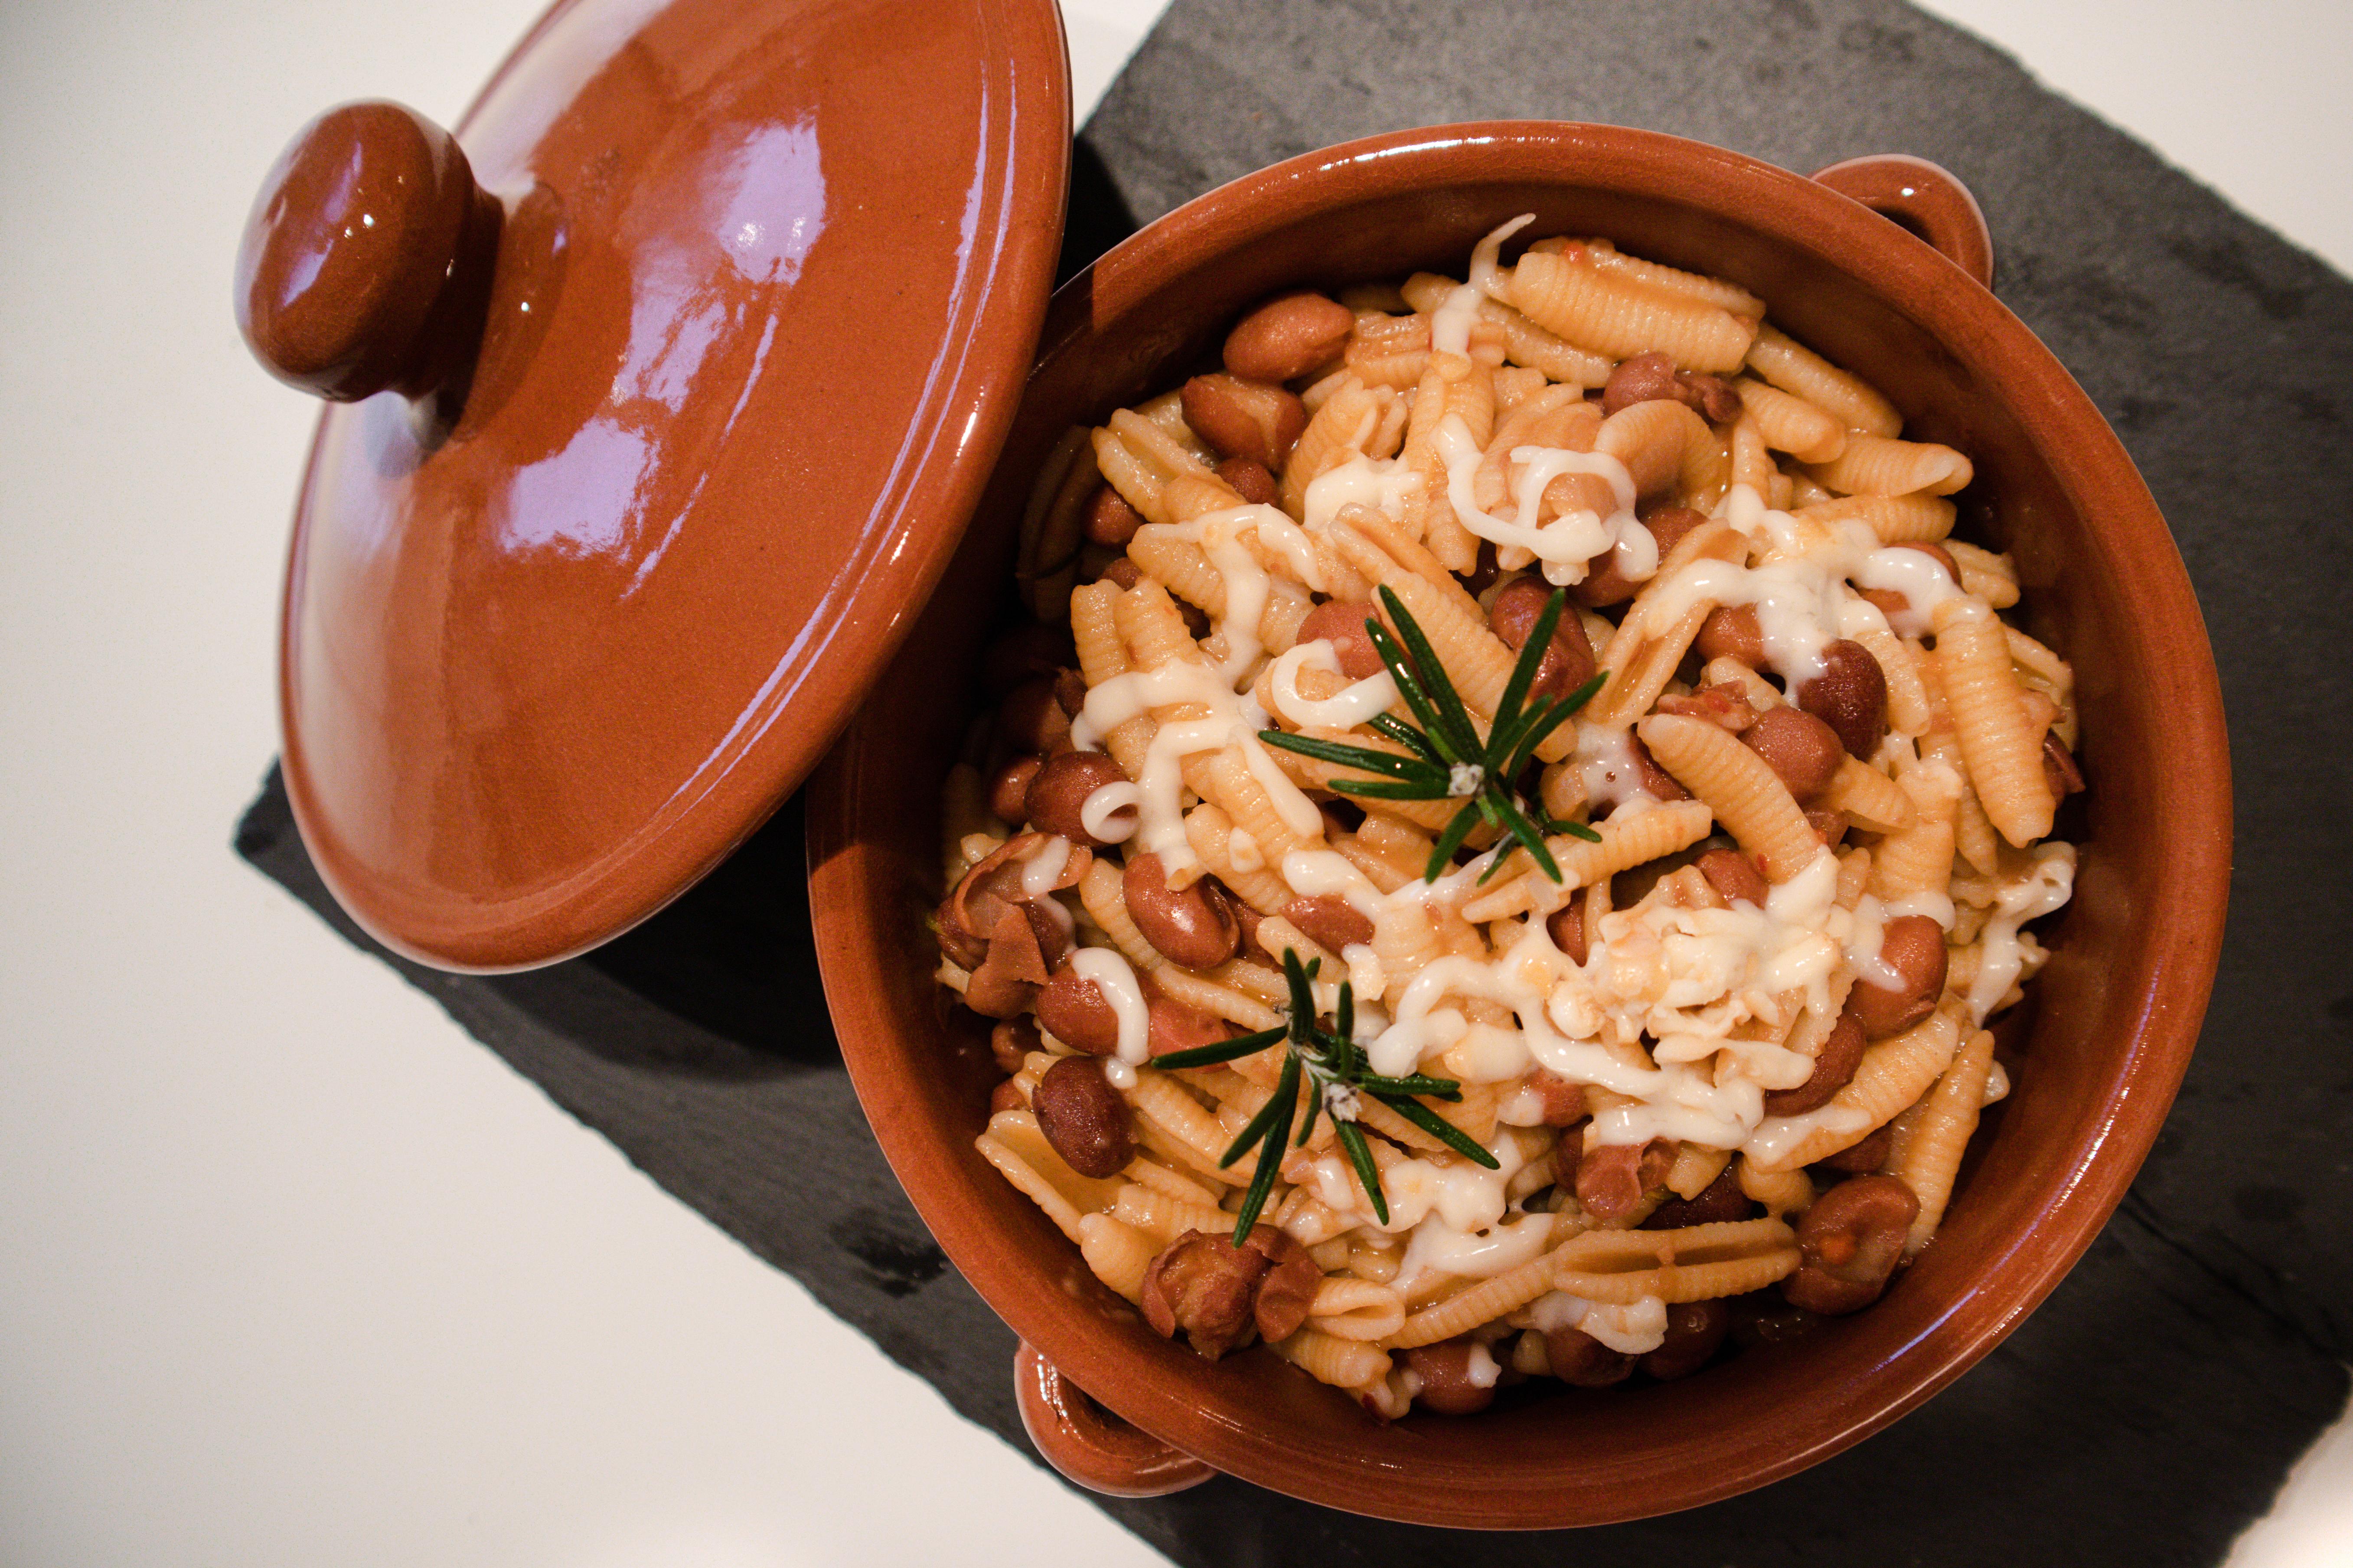 pasta-beans-fagioli-recipe-italian-food-foodblogger-foodblog-blog-thestovediaries